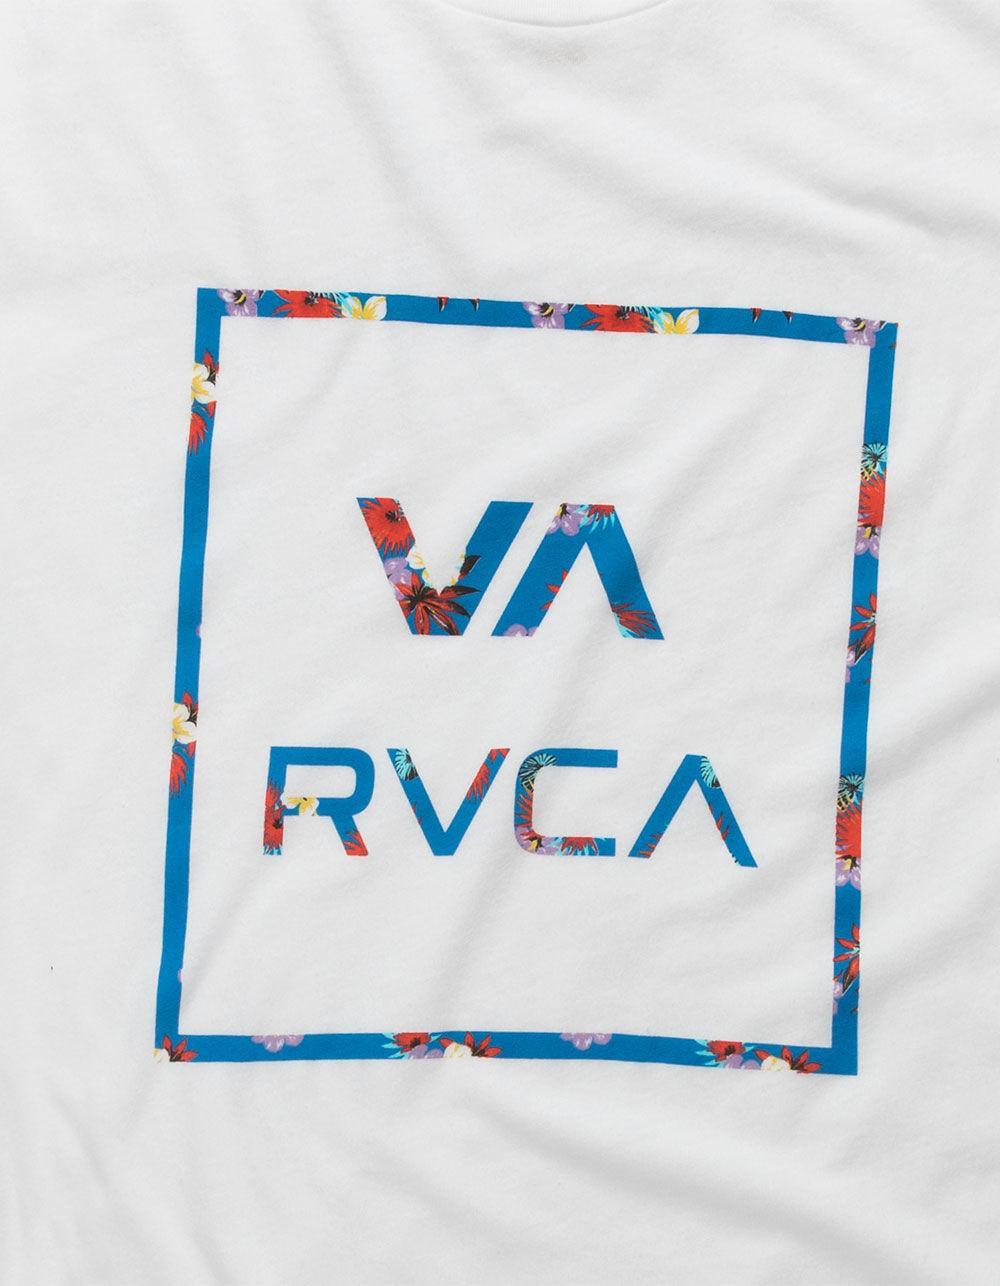 Lyst - RVCA Higgins Atw White Mens T-shirt in White for Men